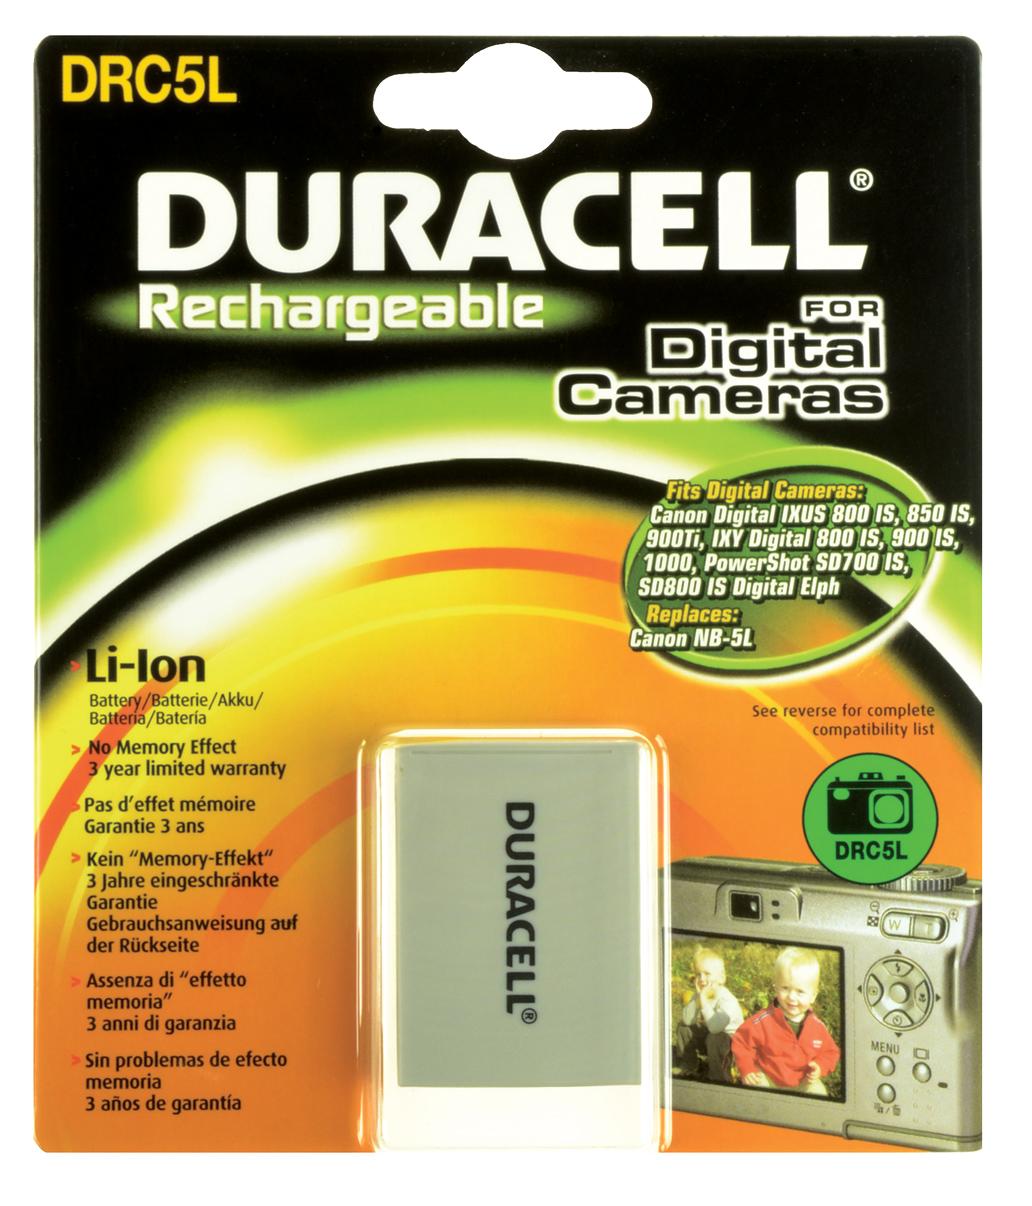 Baterie do fotoaparátu Canon PowerShot SD800 IS/SD800 IS Digital ELPH/SD850/SD850 IS/SD870 IS/SD880 IS/SD890 IS/SD900/SD900 Digital ELPH/SD950,…